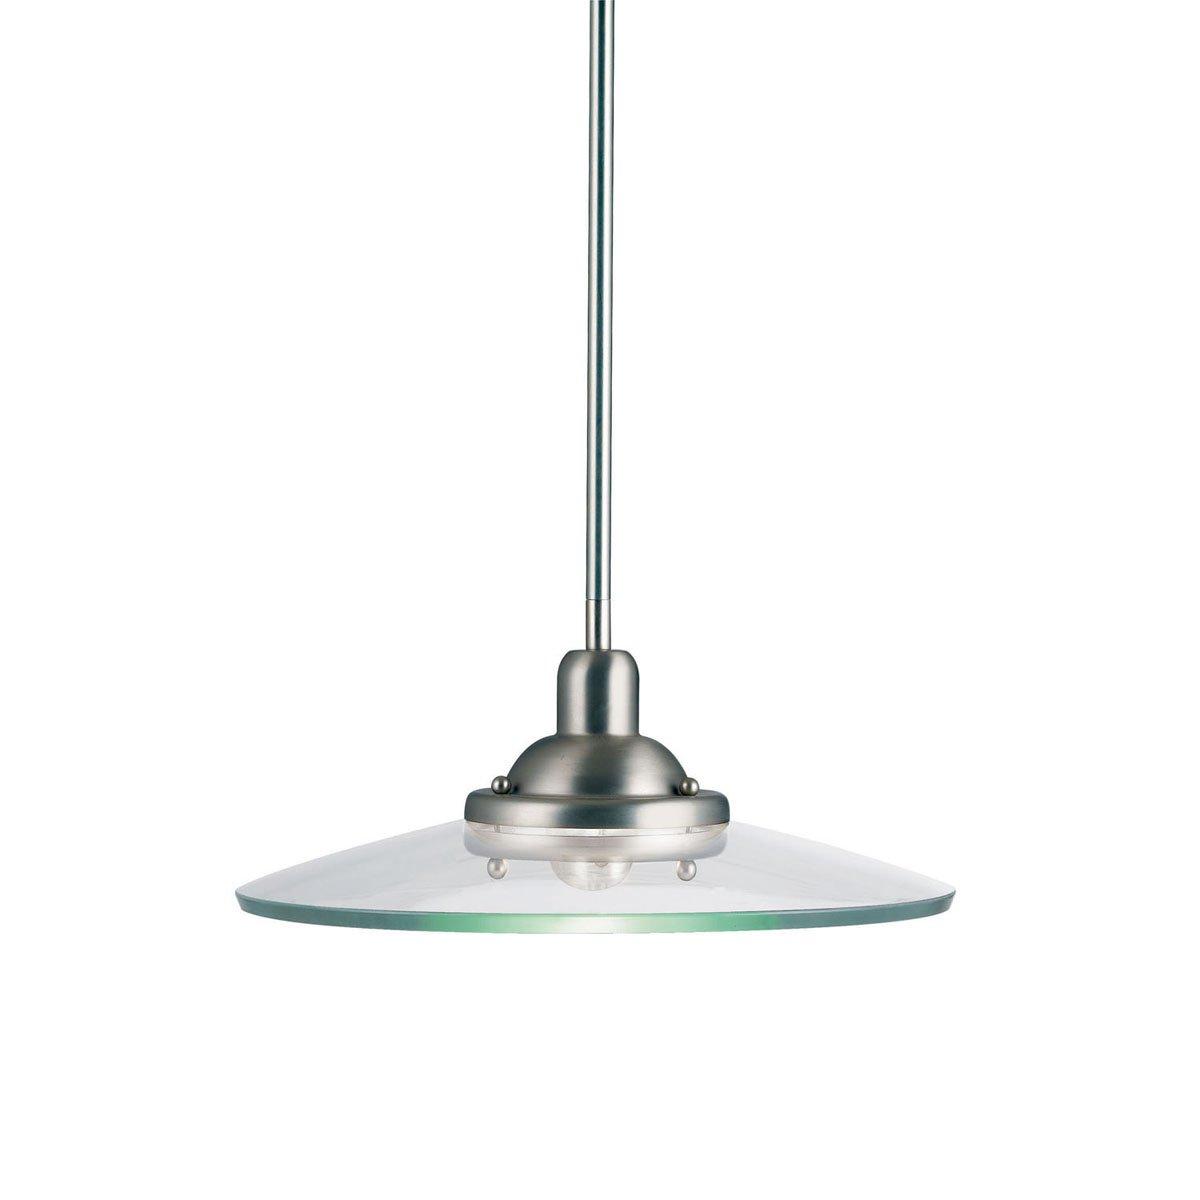 Kichler 2641ni one light mini pendant ceiling pendant fixtures kichler 2641ni one light mini pendant ceiling pendant fixtures amazon aloadofball Gallery